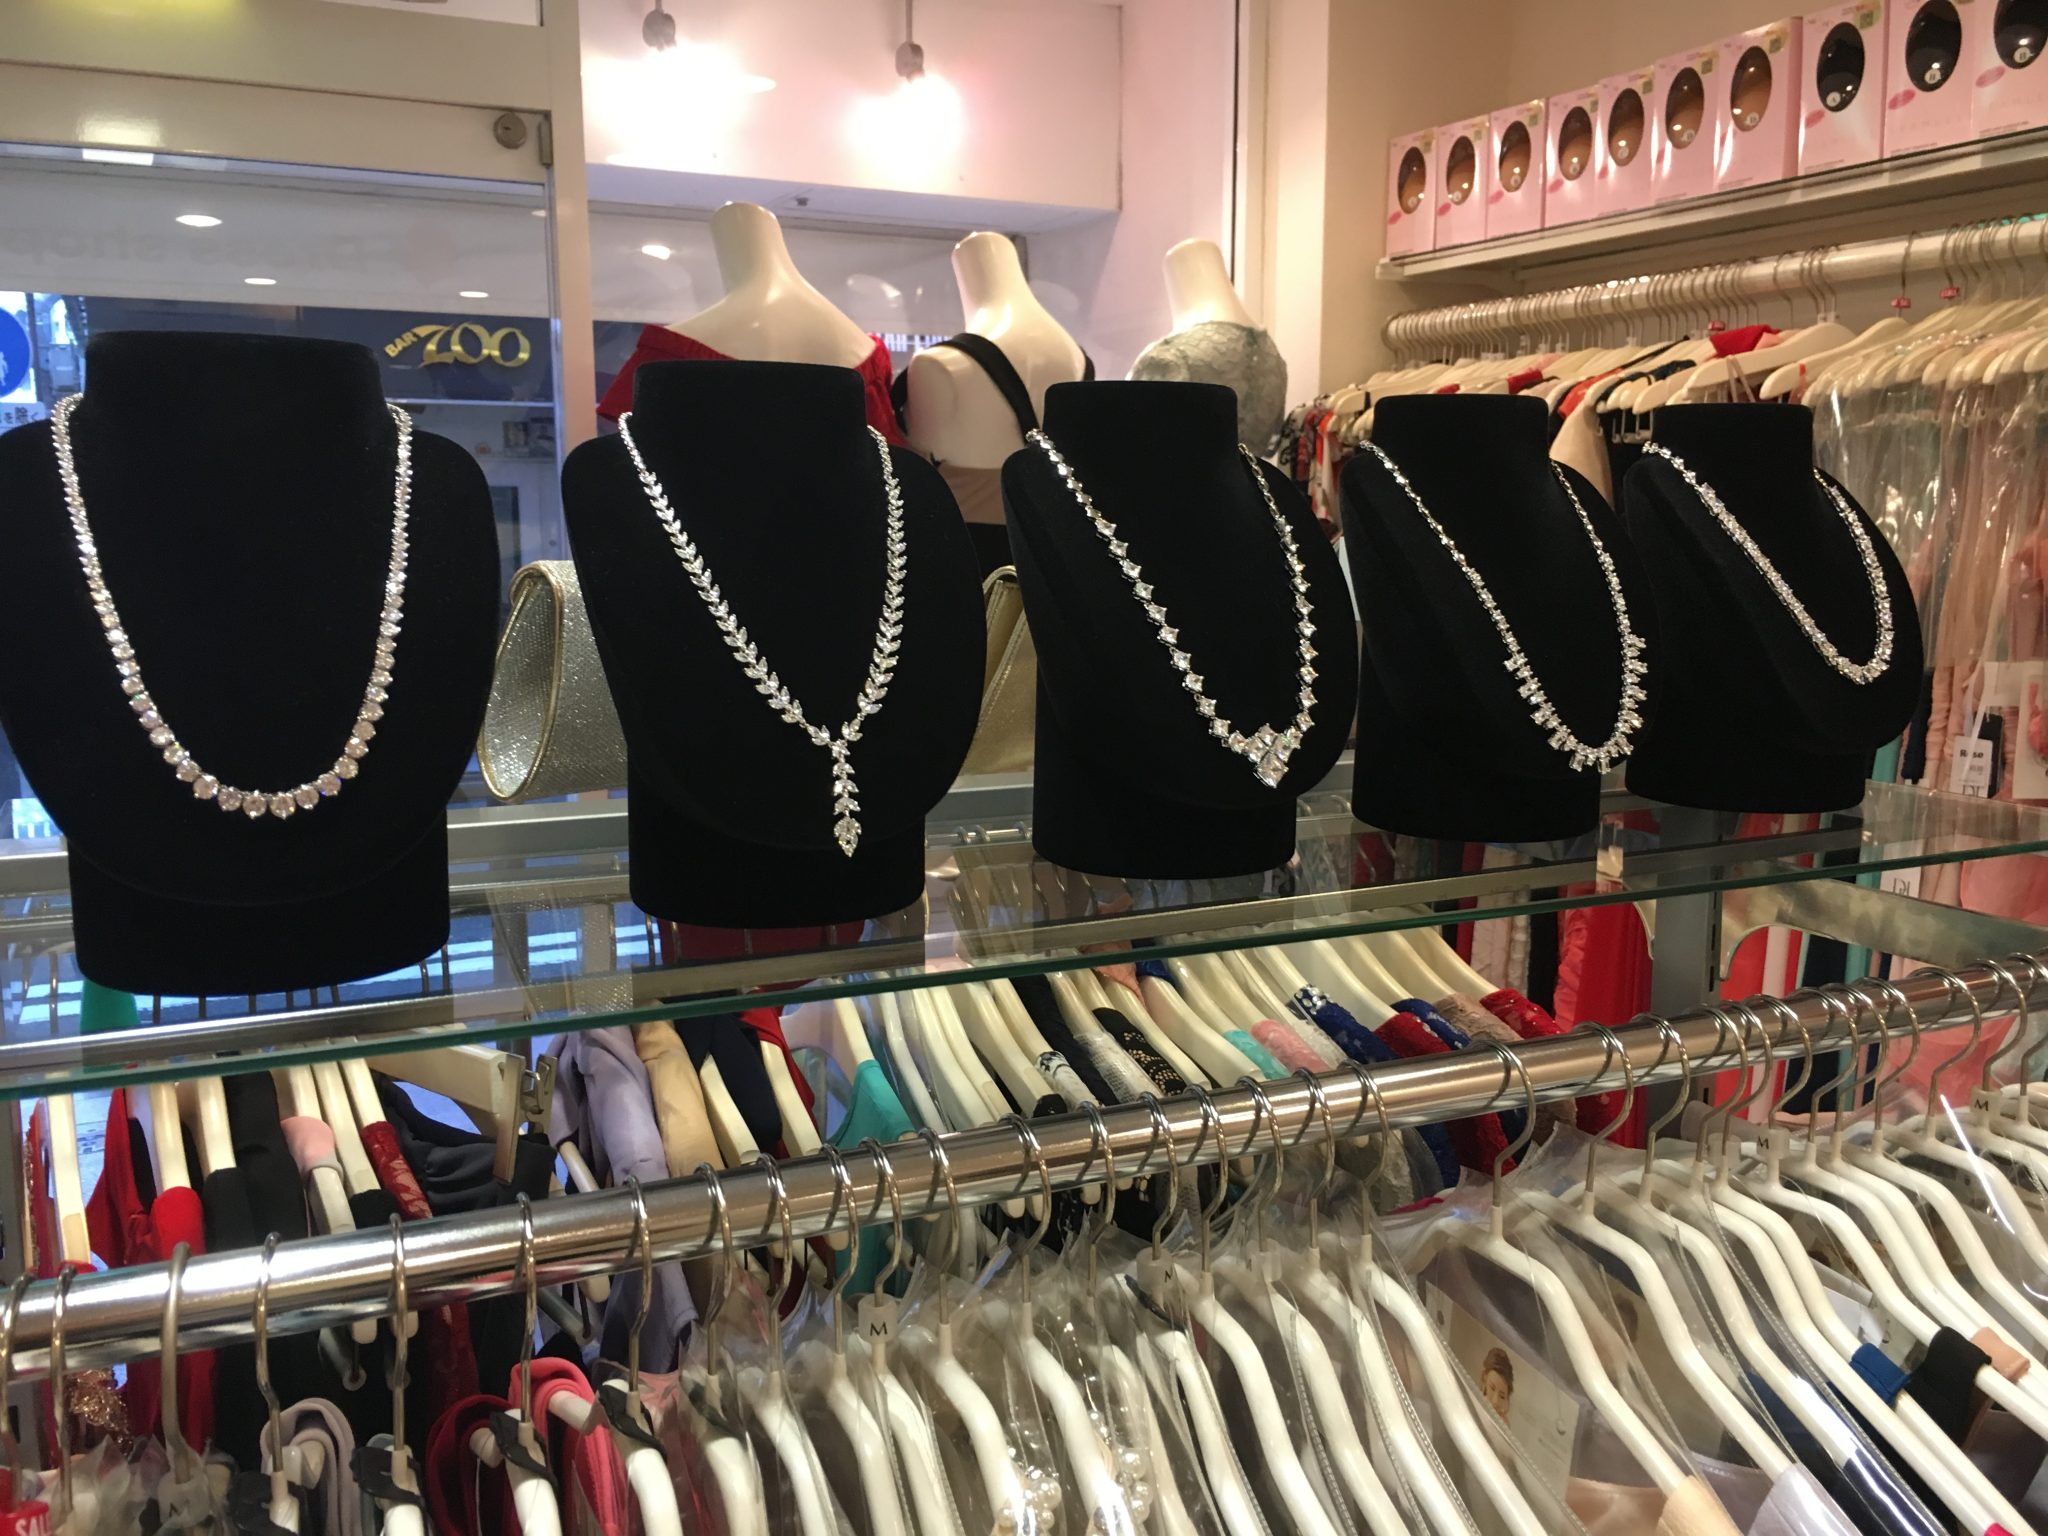 ROSEドレスショップローズ 中洲店その他の商品